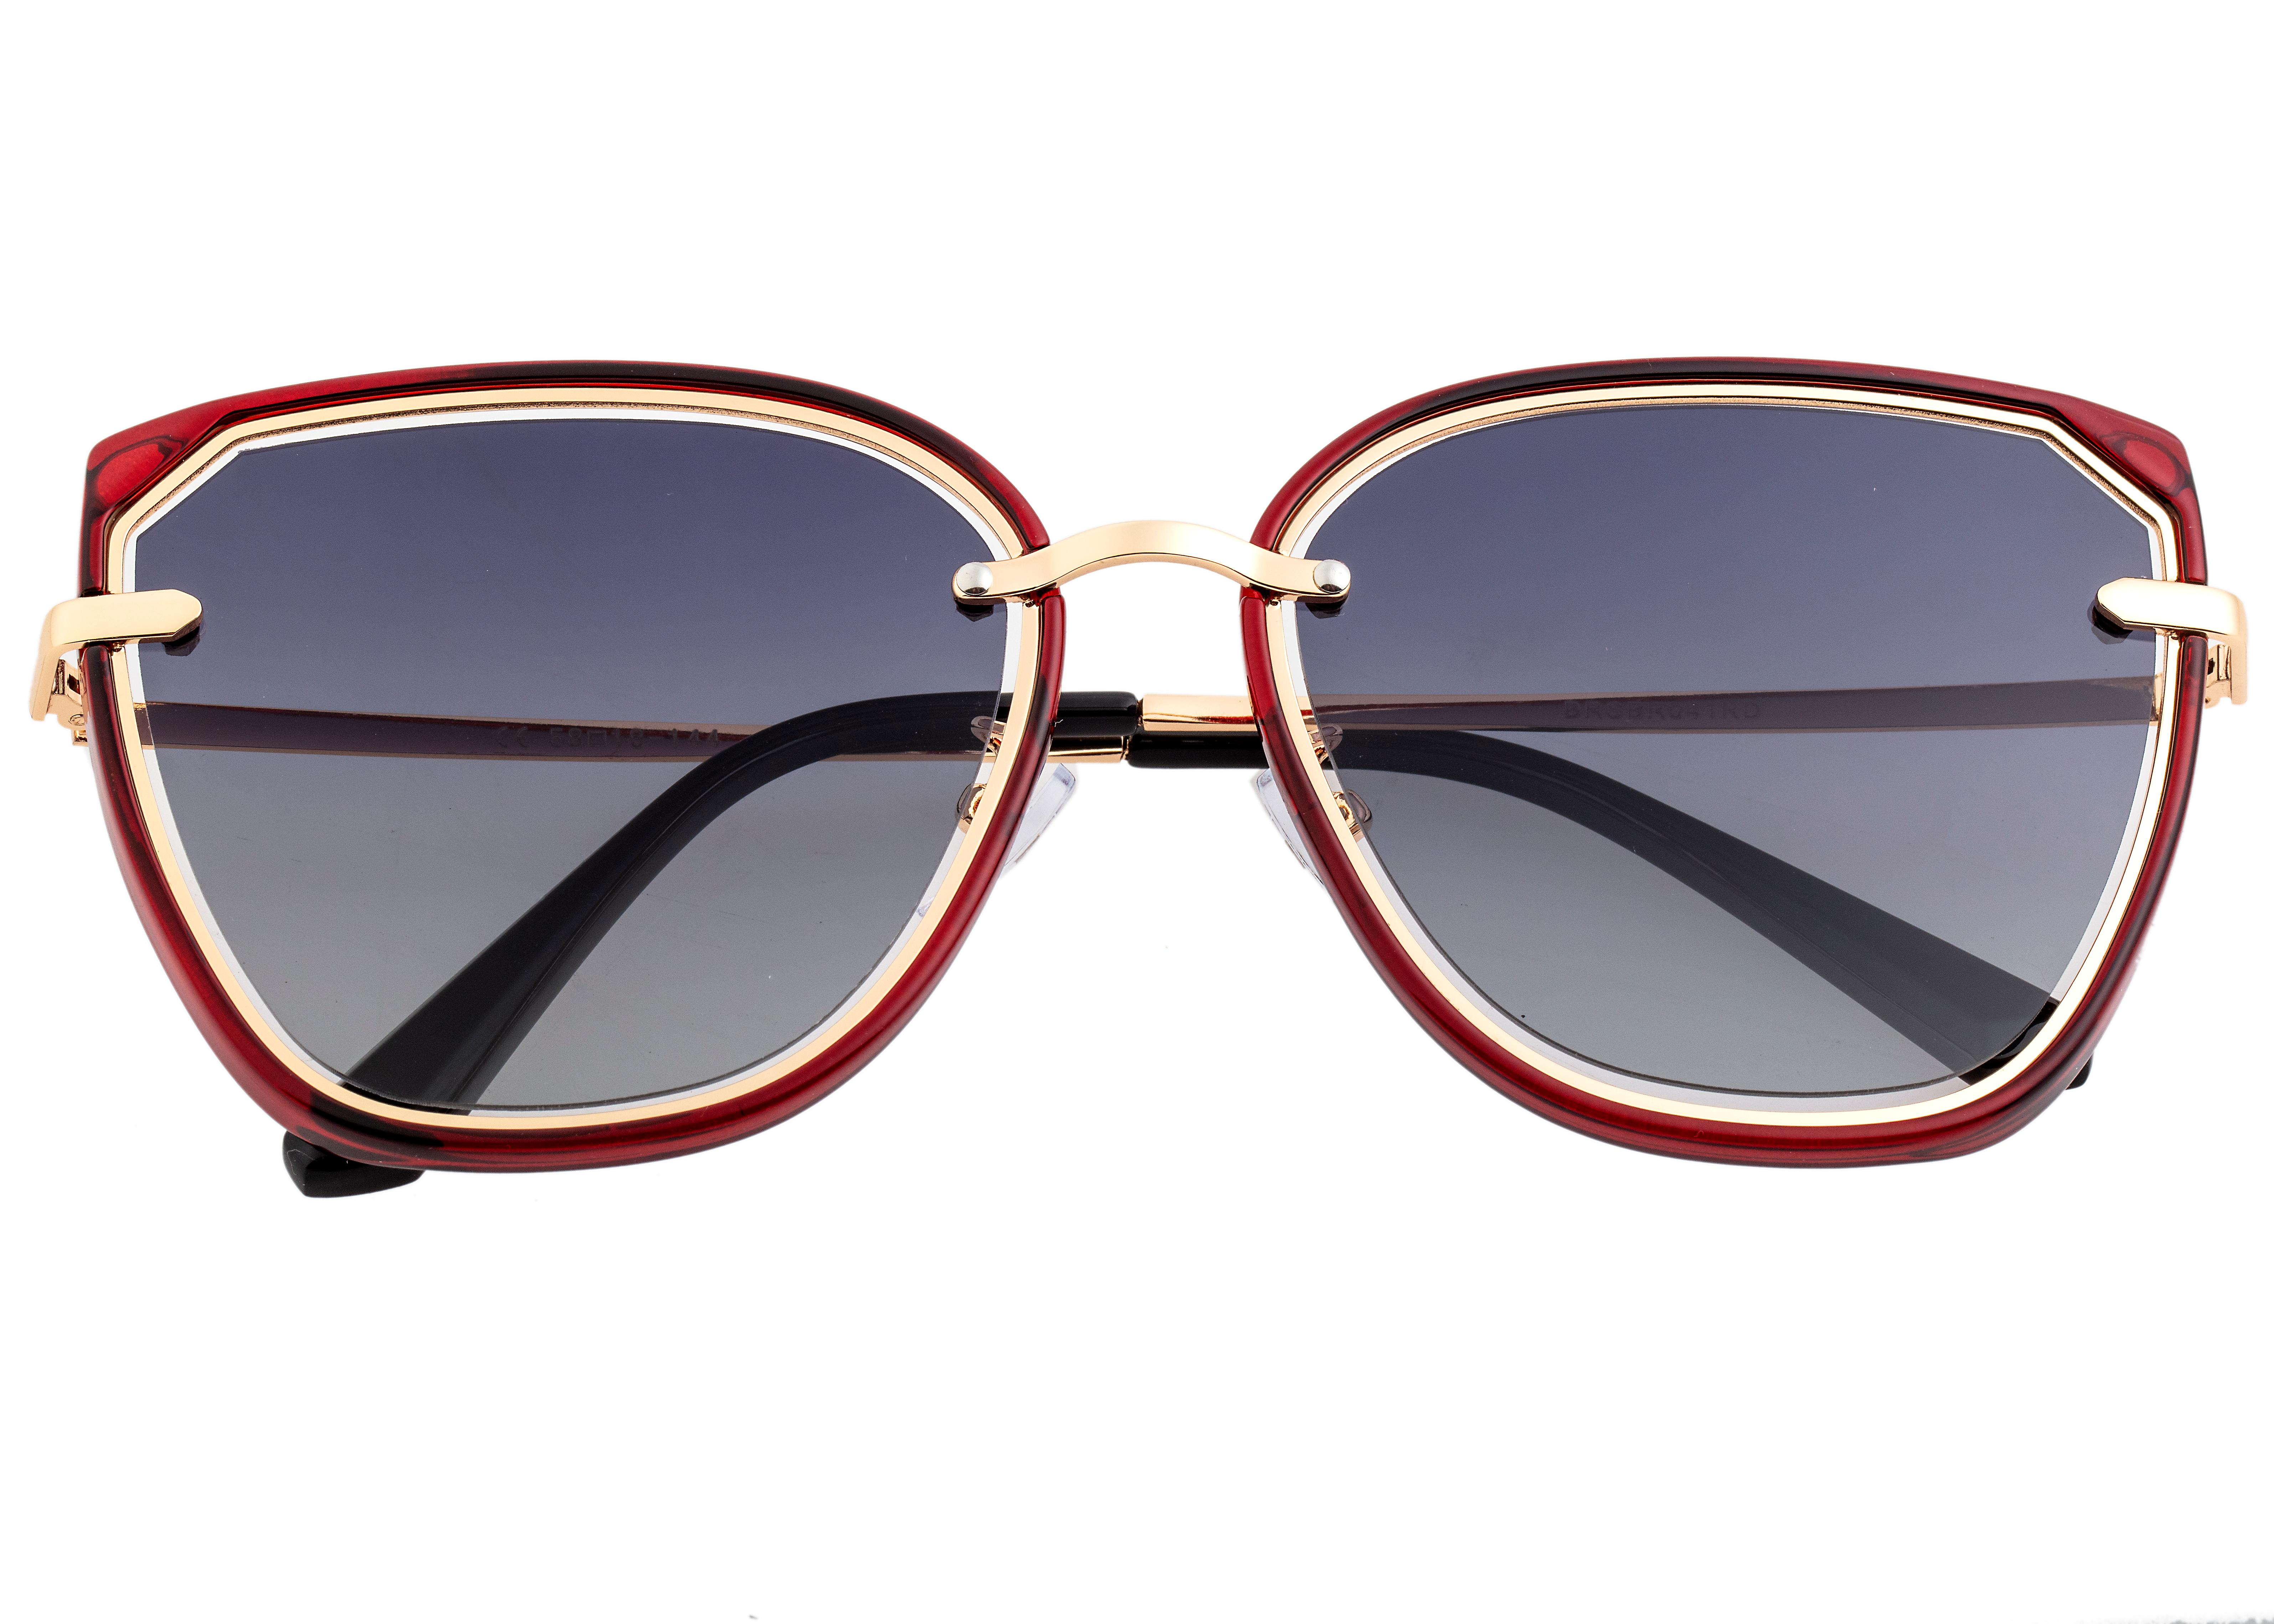 Bertha Rylee Polarized Sunglasses - Red/Black